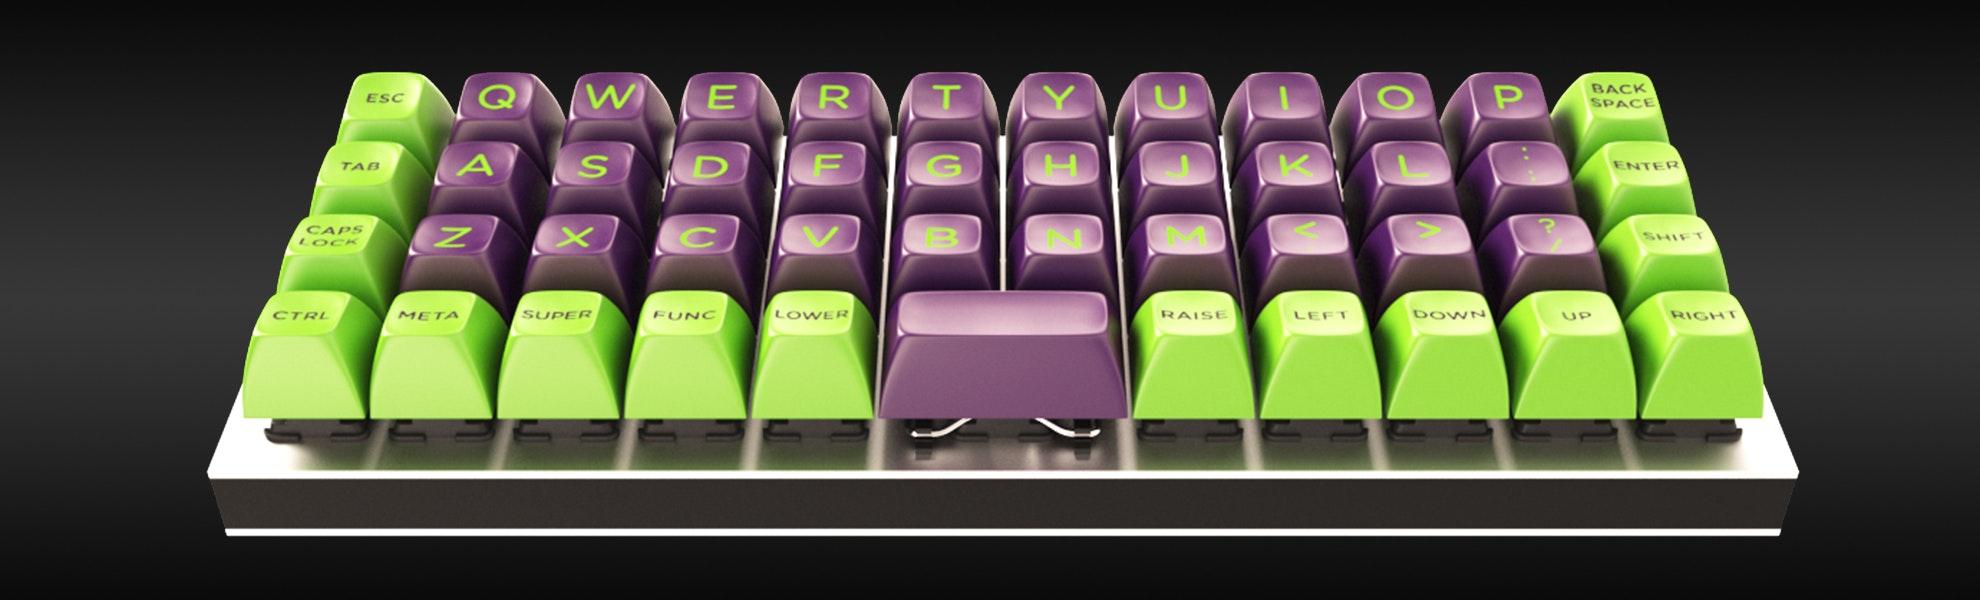 Troubled Minds SA Keycap Set